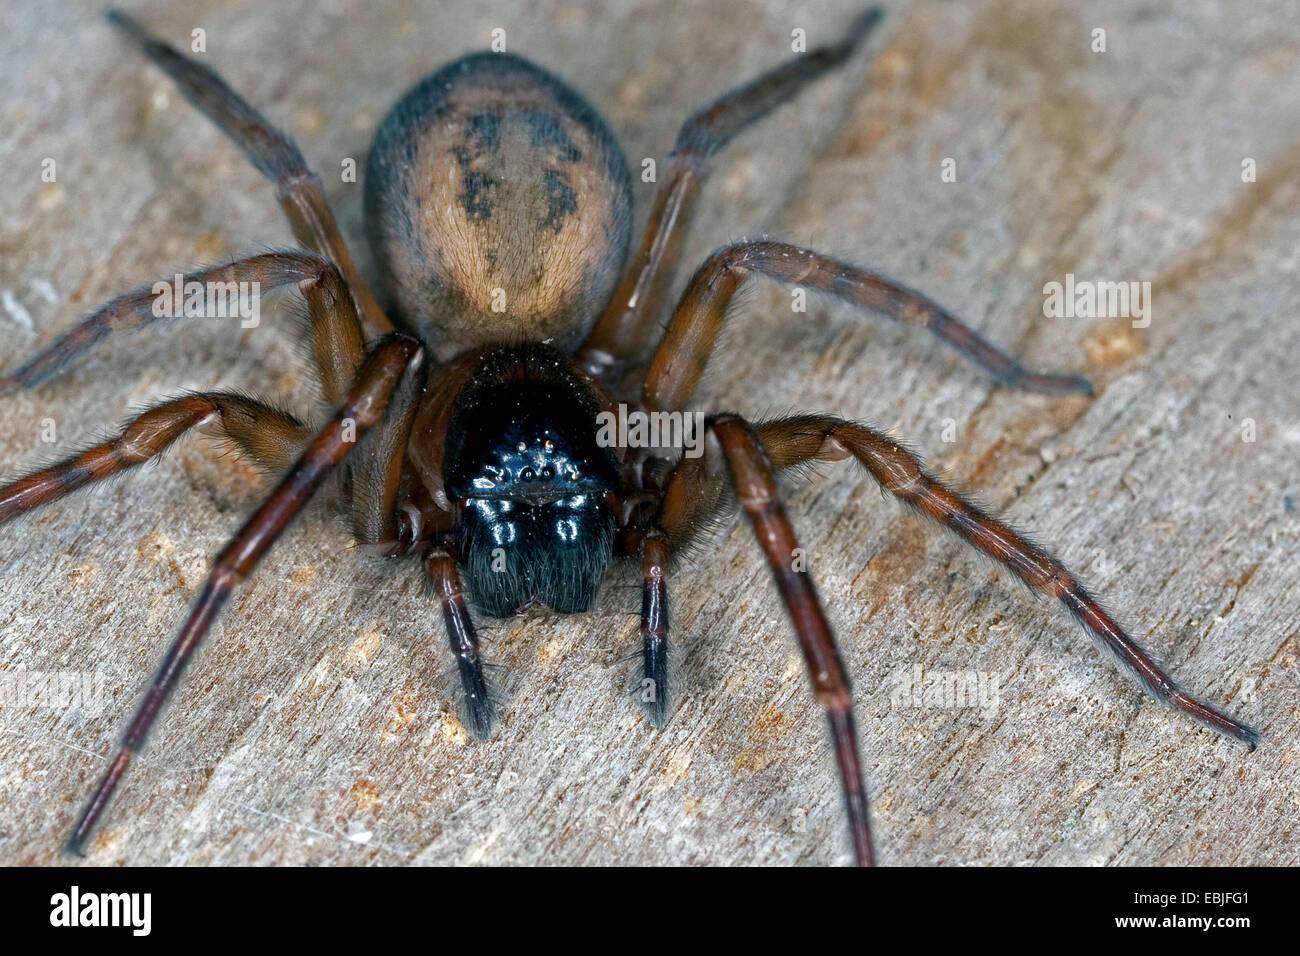 Window lace weaver, House spider mouthparts (Amaurobius similis), female, portrait, Germany - Stock Image